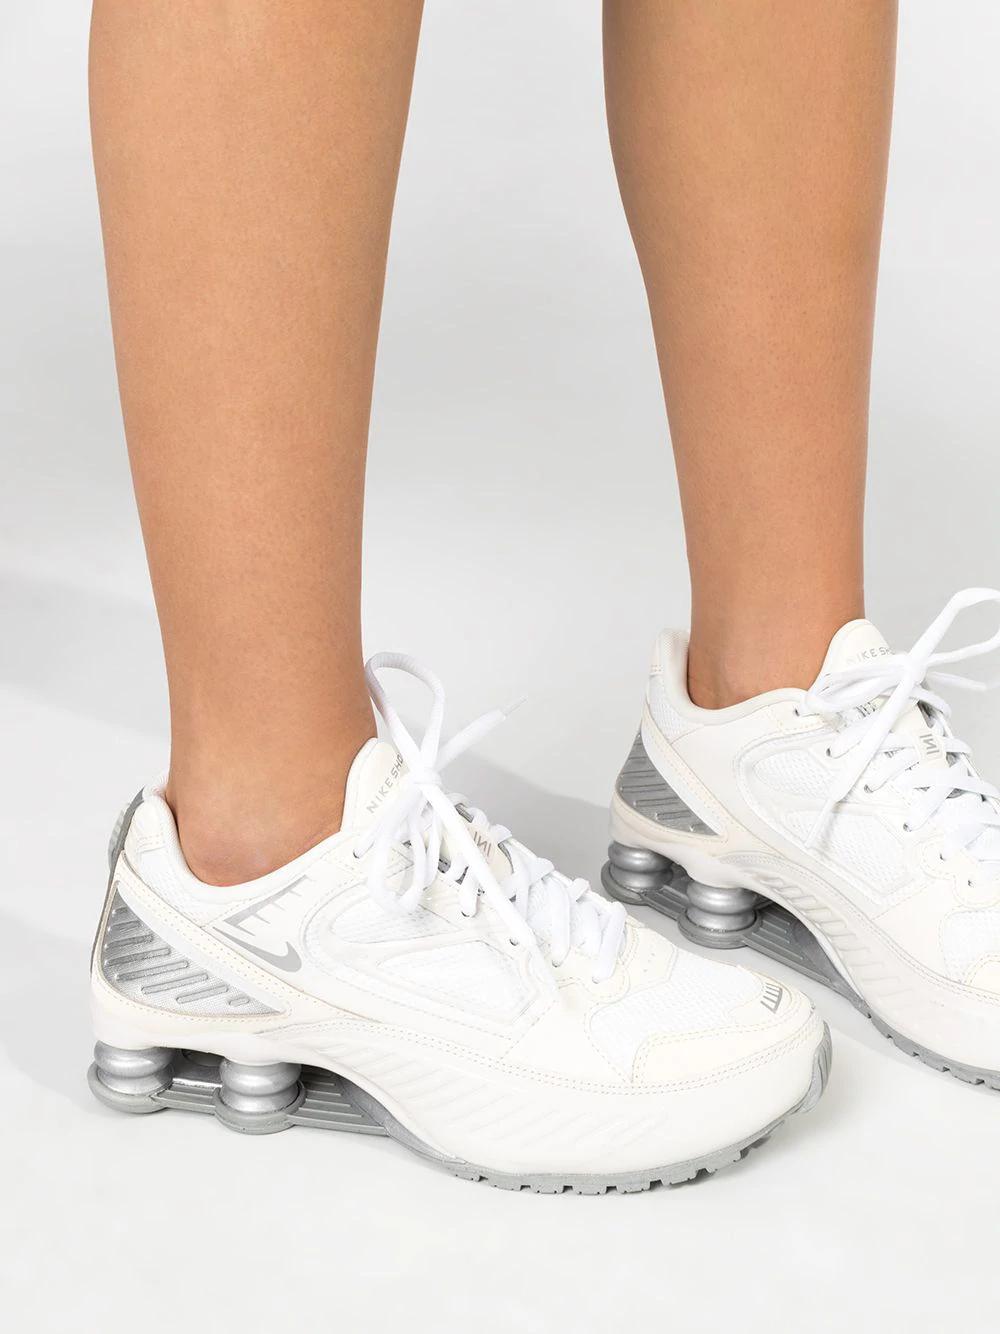 Nike Shox Enigma 9000 Sneakers - Farfetch in 2020   Nike ...